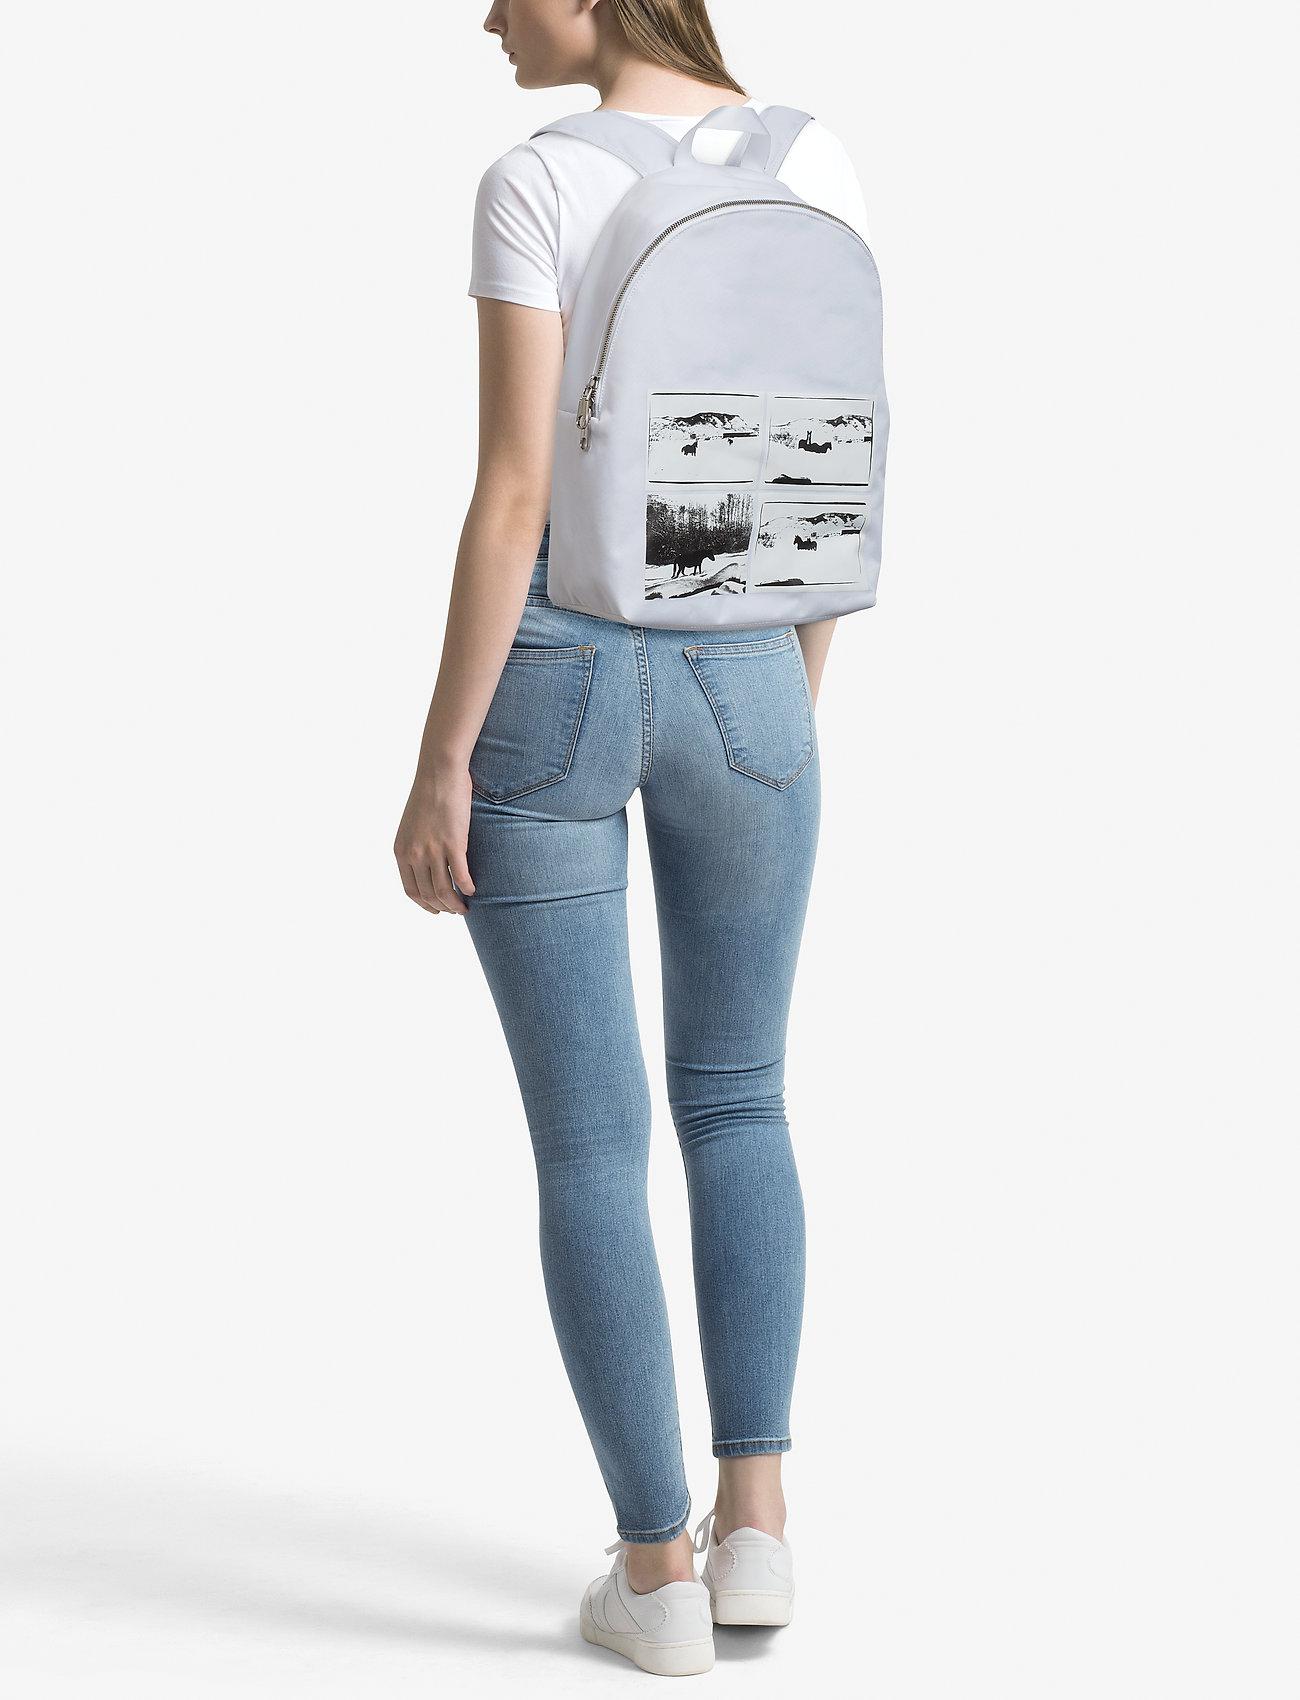 Calvin Klein WARHOL HORSES IN SNO - BRIGHT WHITE